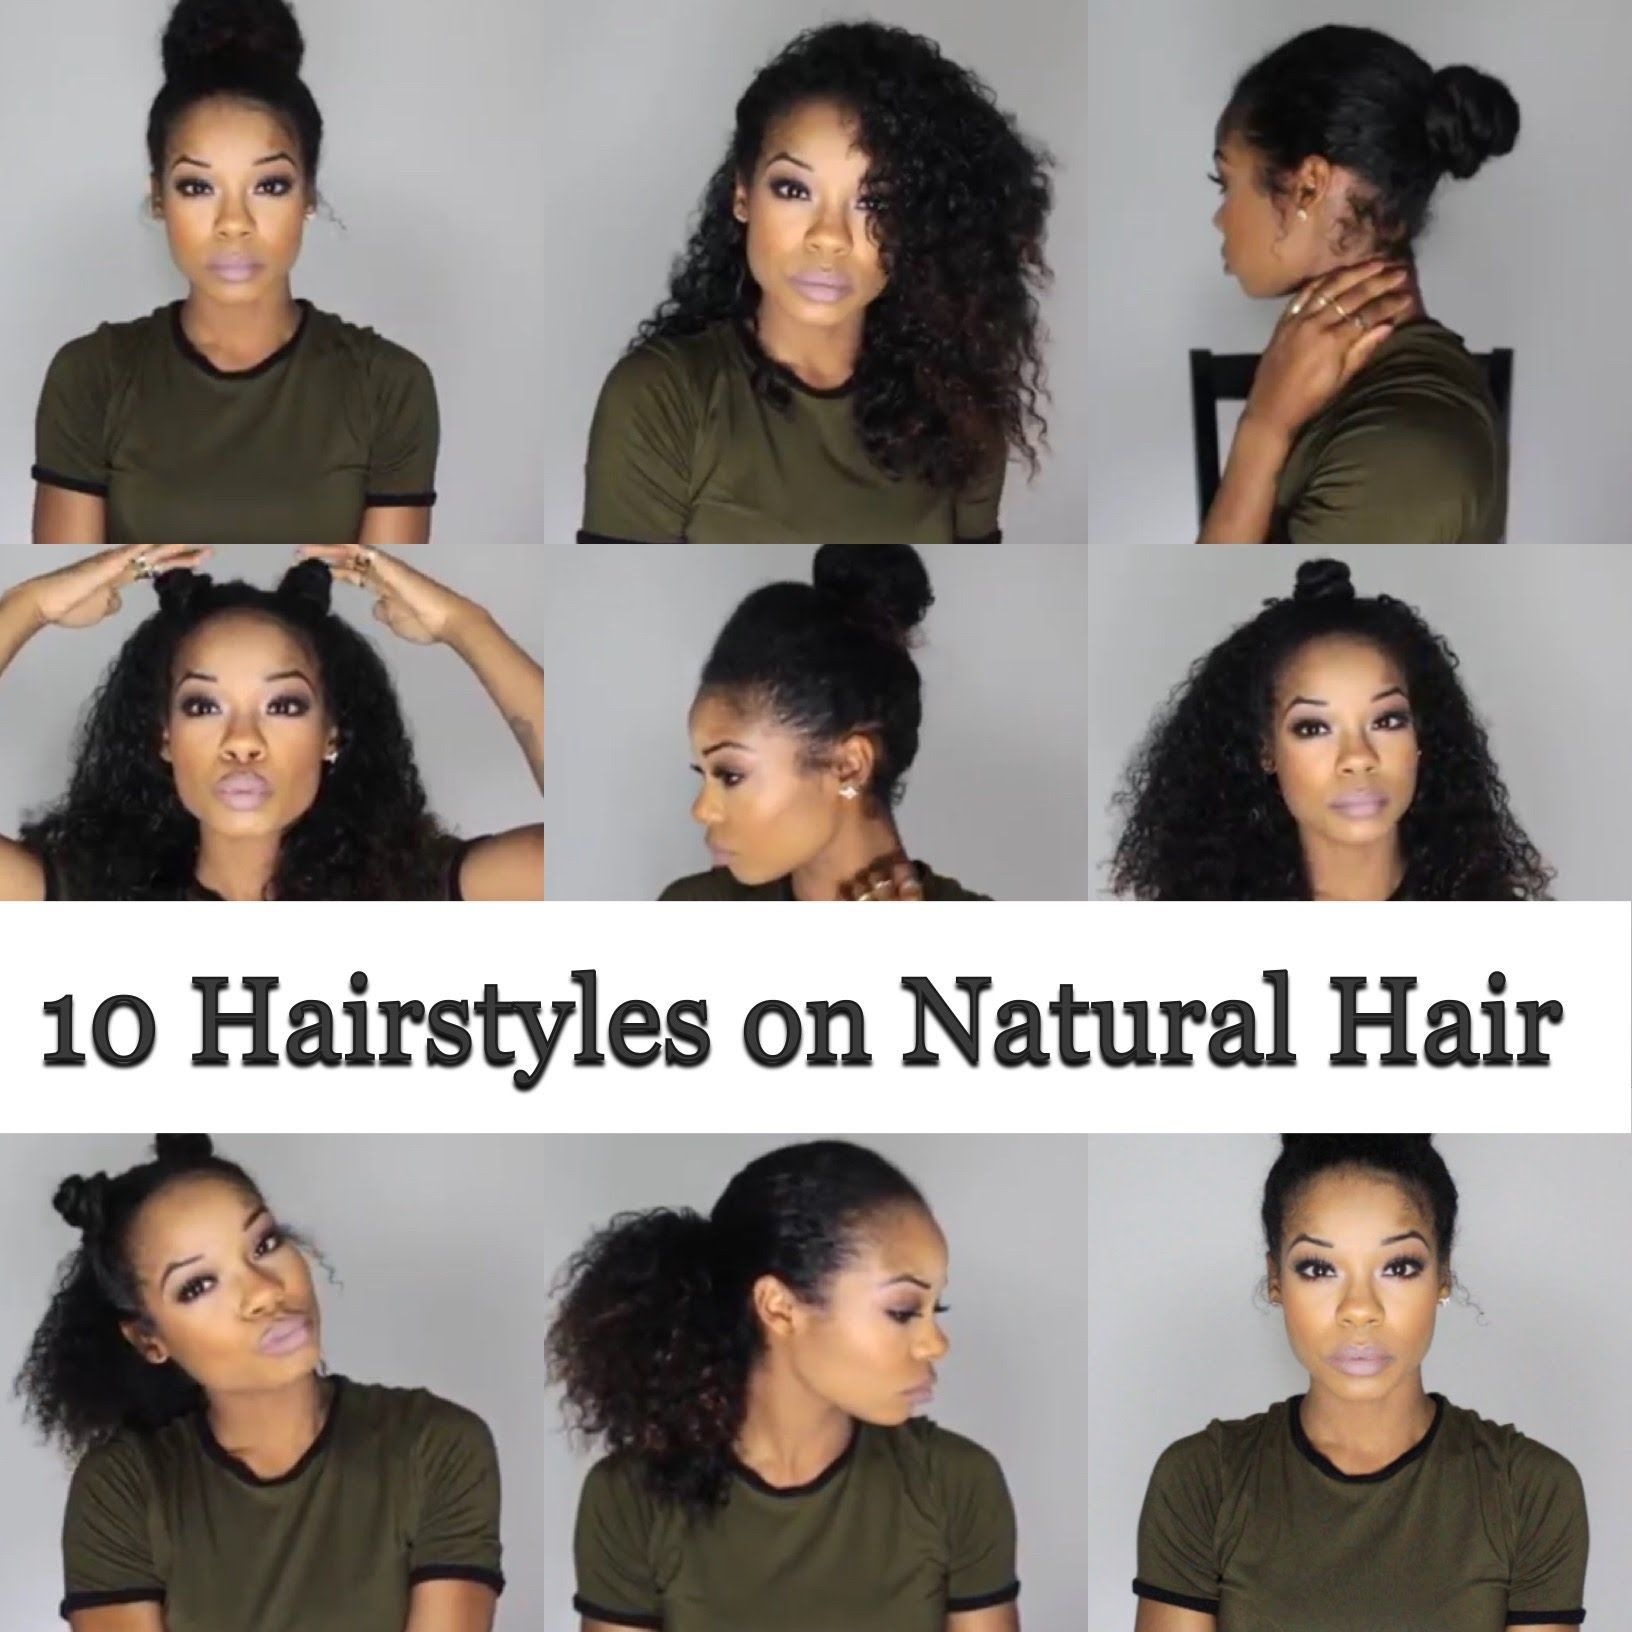 natural hairstyles for short 3b hair | hairstyles | 3c hair